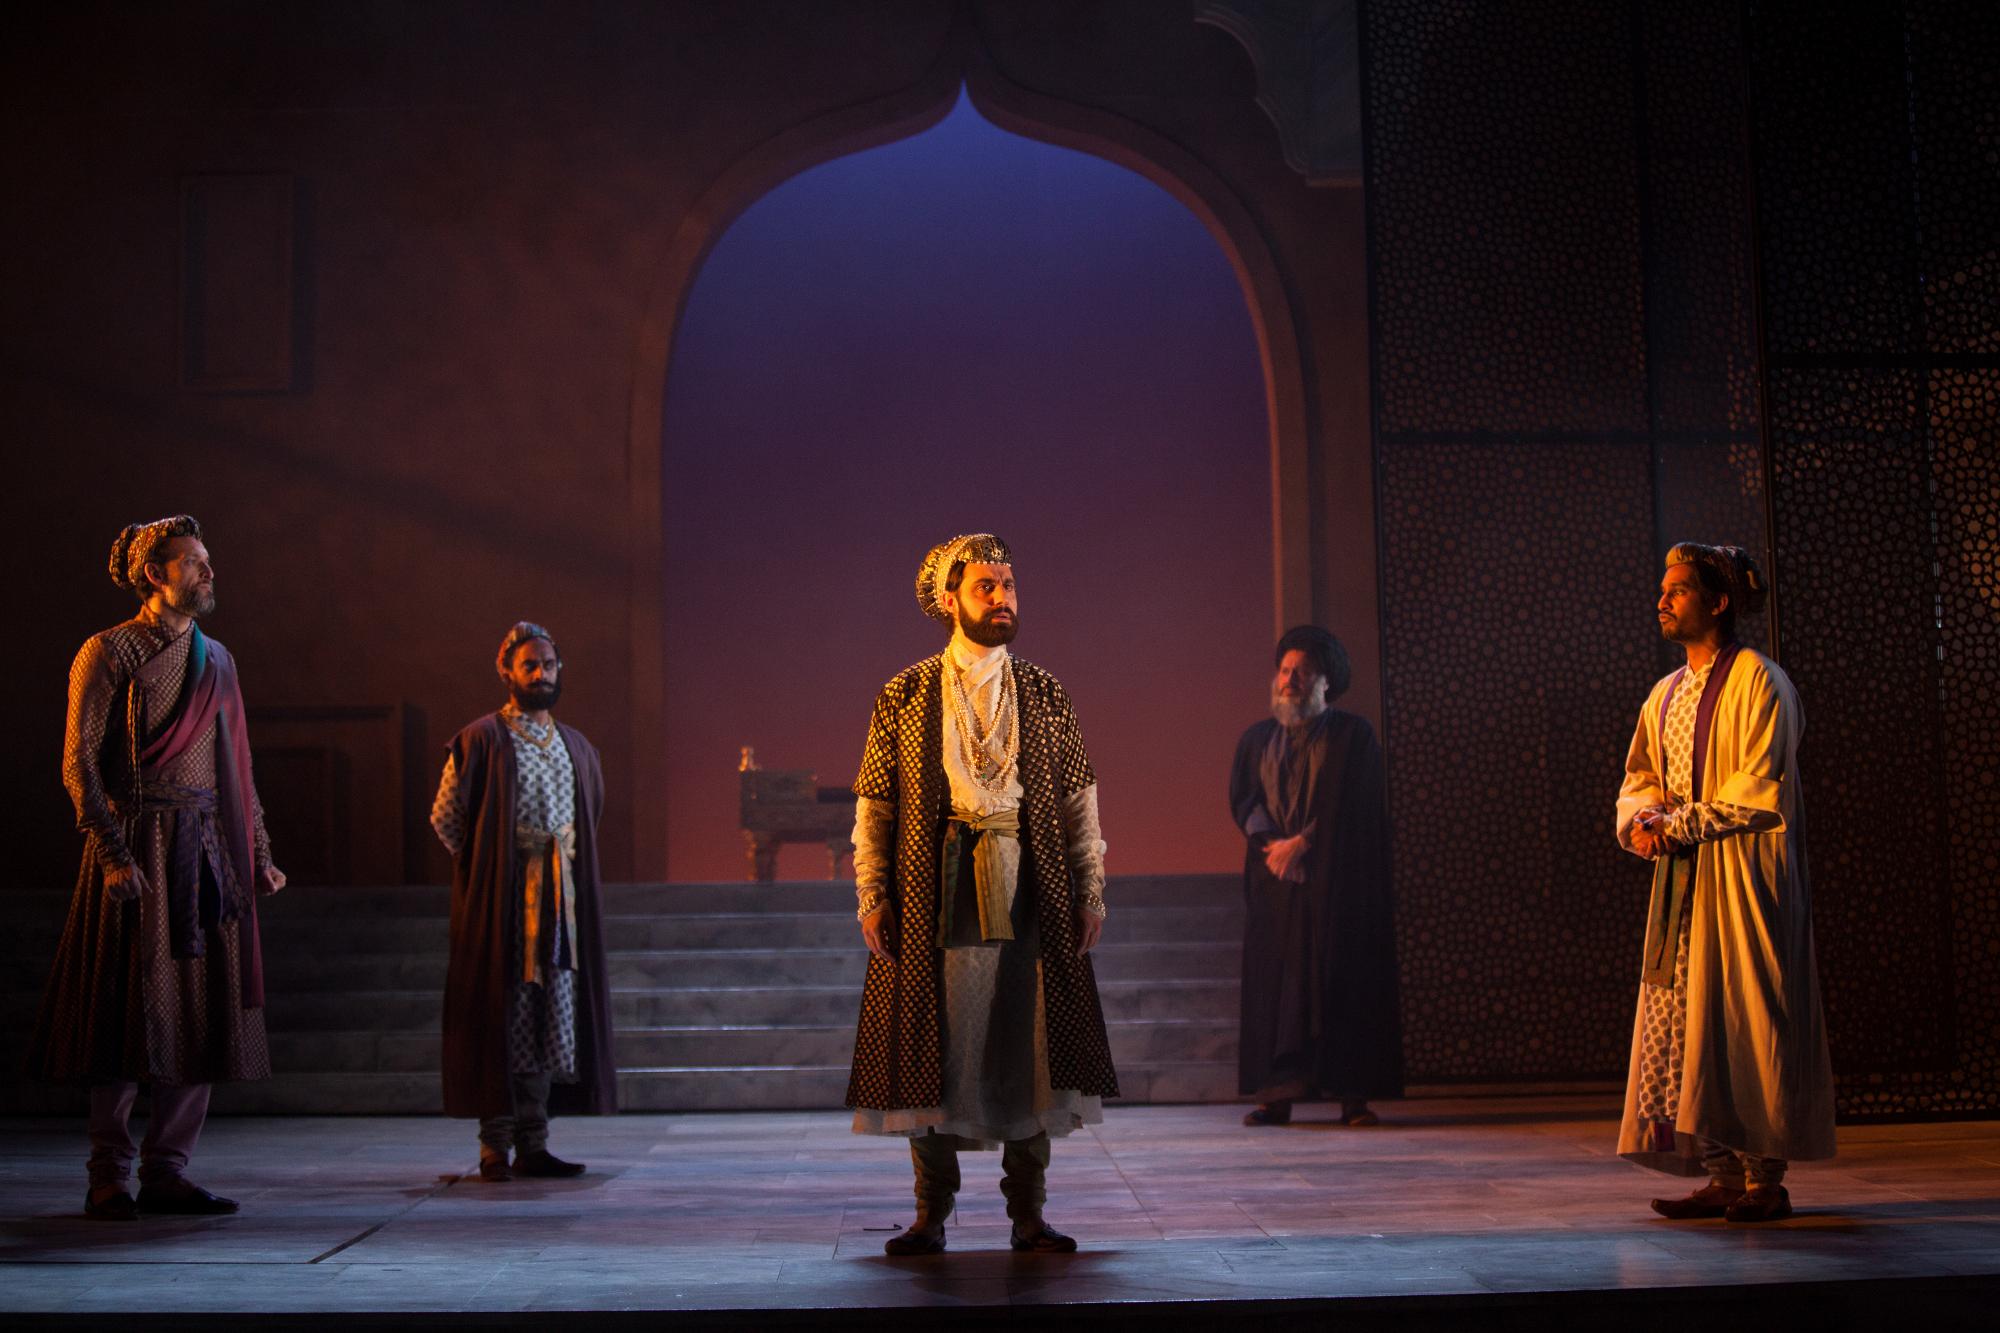 Nicholas Khan (Mir Khalil), Esh Alladi (Gvernor Khan), Sargon Yelda (Aurangzeb), Simon Nagra (Mullah Farooq), Rudi Dharmalingham (Danishmand) by Ellie Kurttz